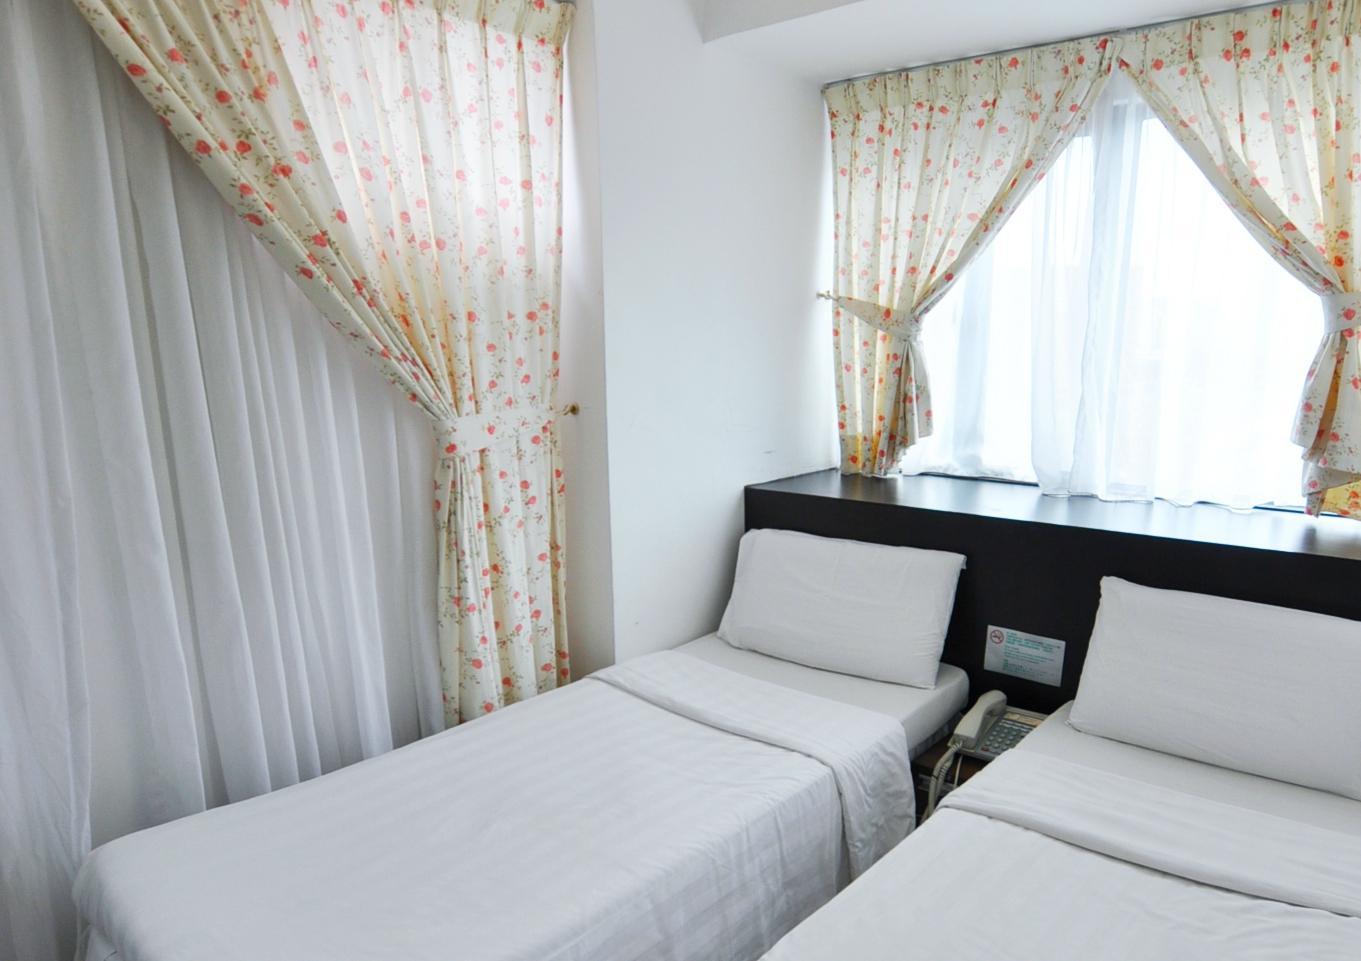 Bridal Tea House Hotel Hung Hom - Winslow Street